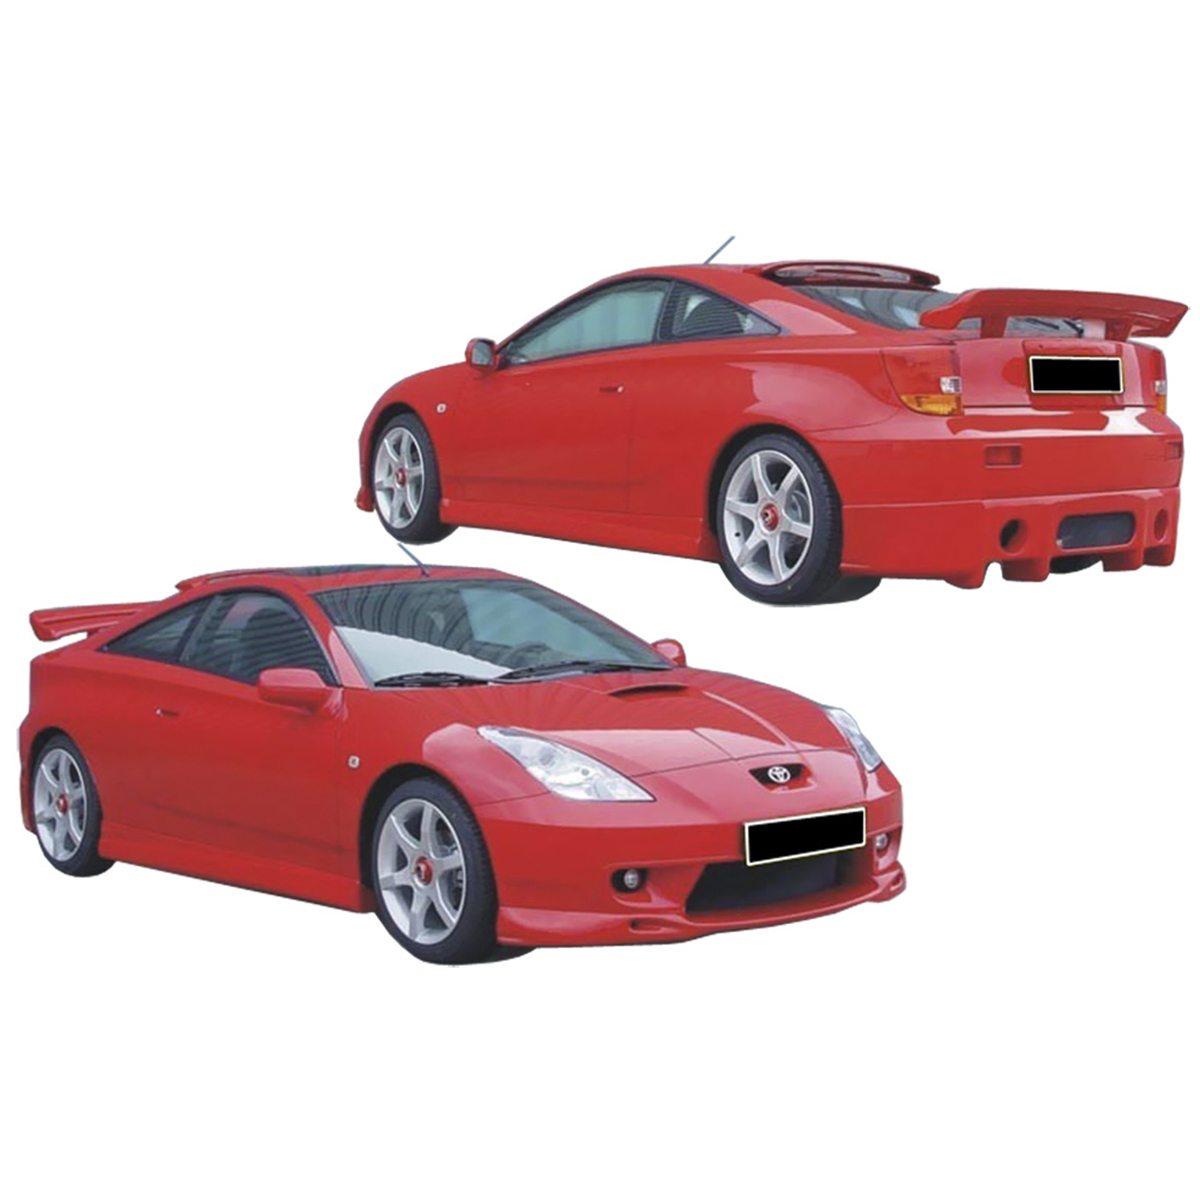 Toyota-Celica-00-KIT-QTU247